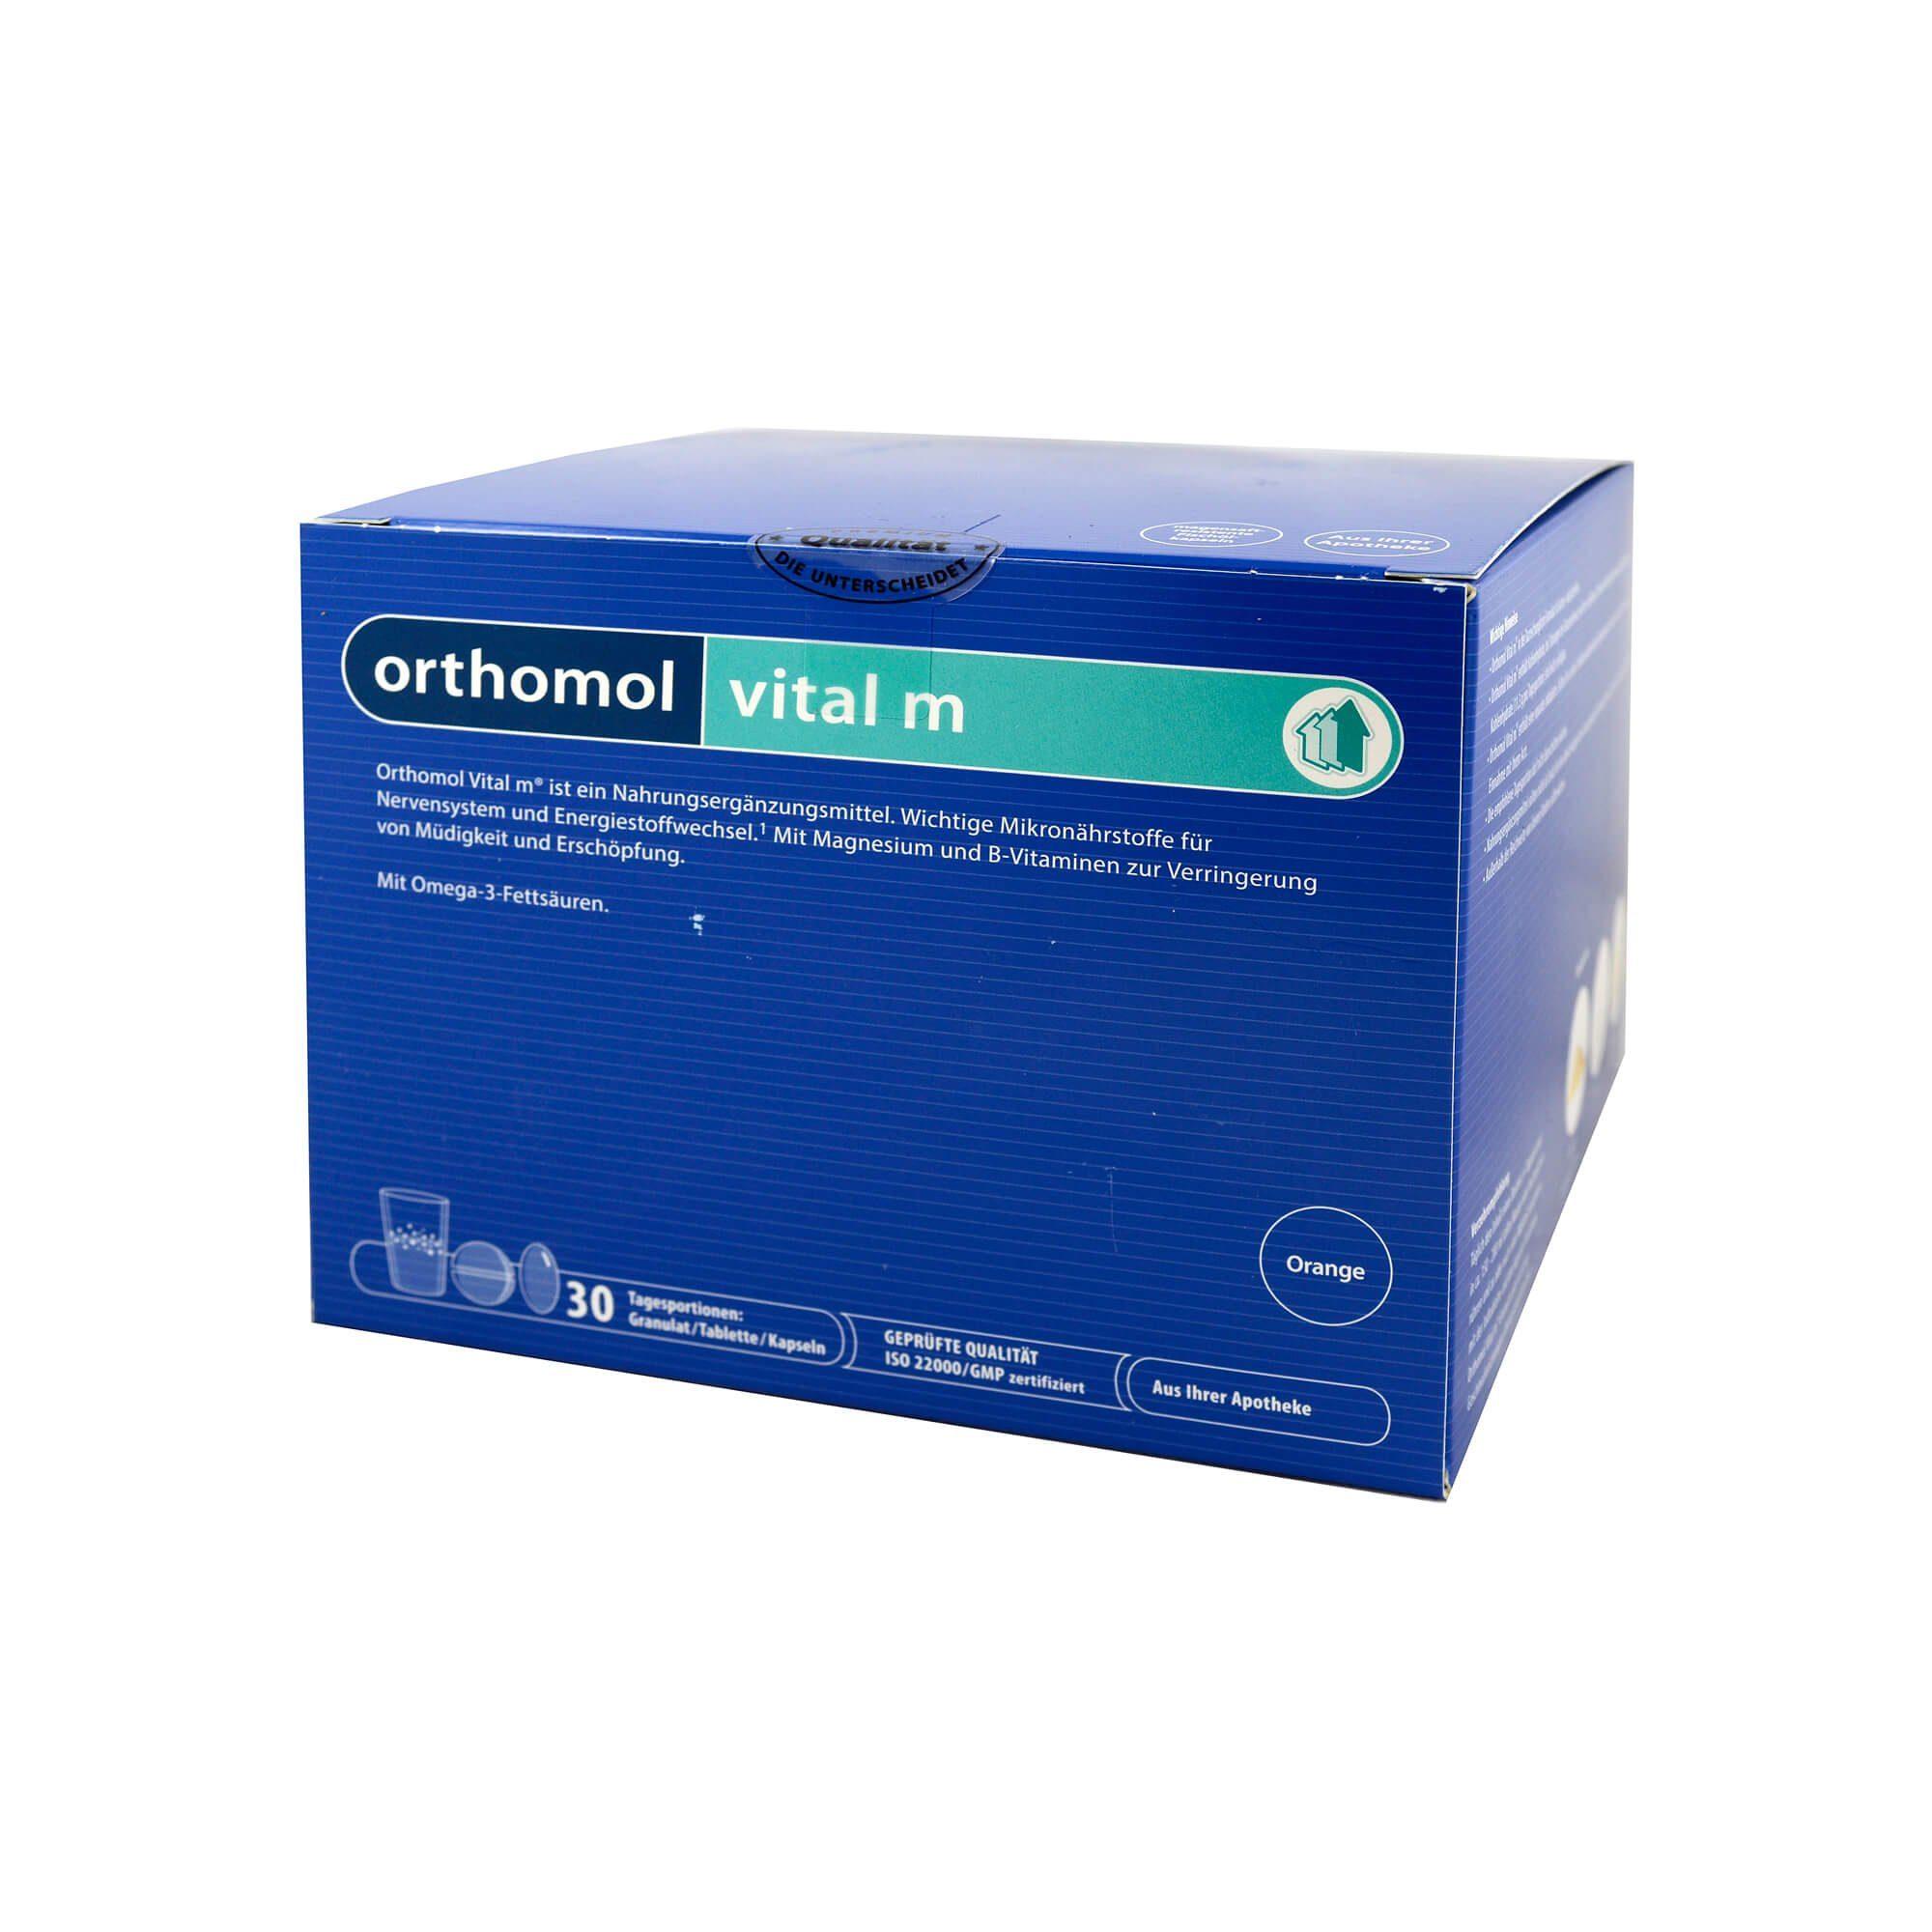 Orthomol Vital M 30 Granulat/Kapseln Kombipackung, 1 St